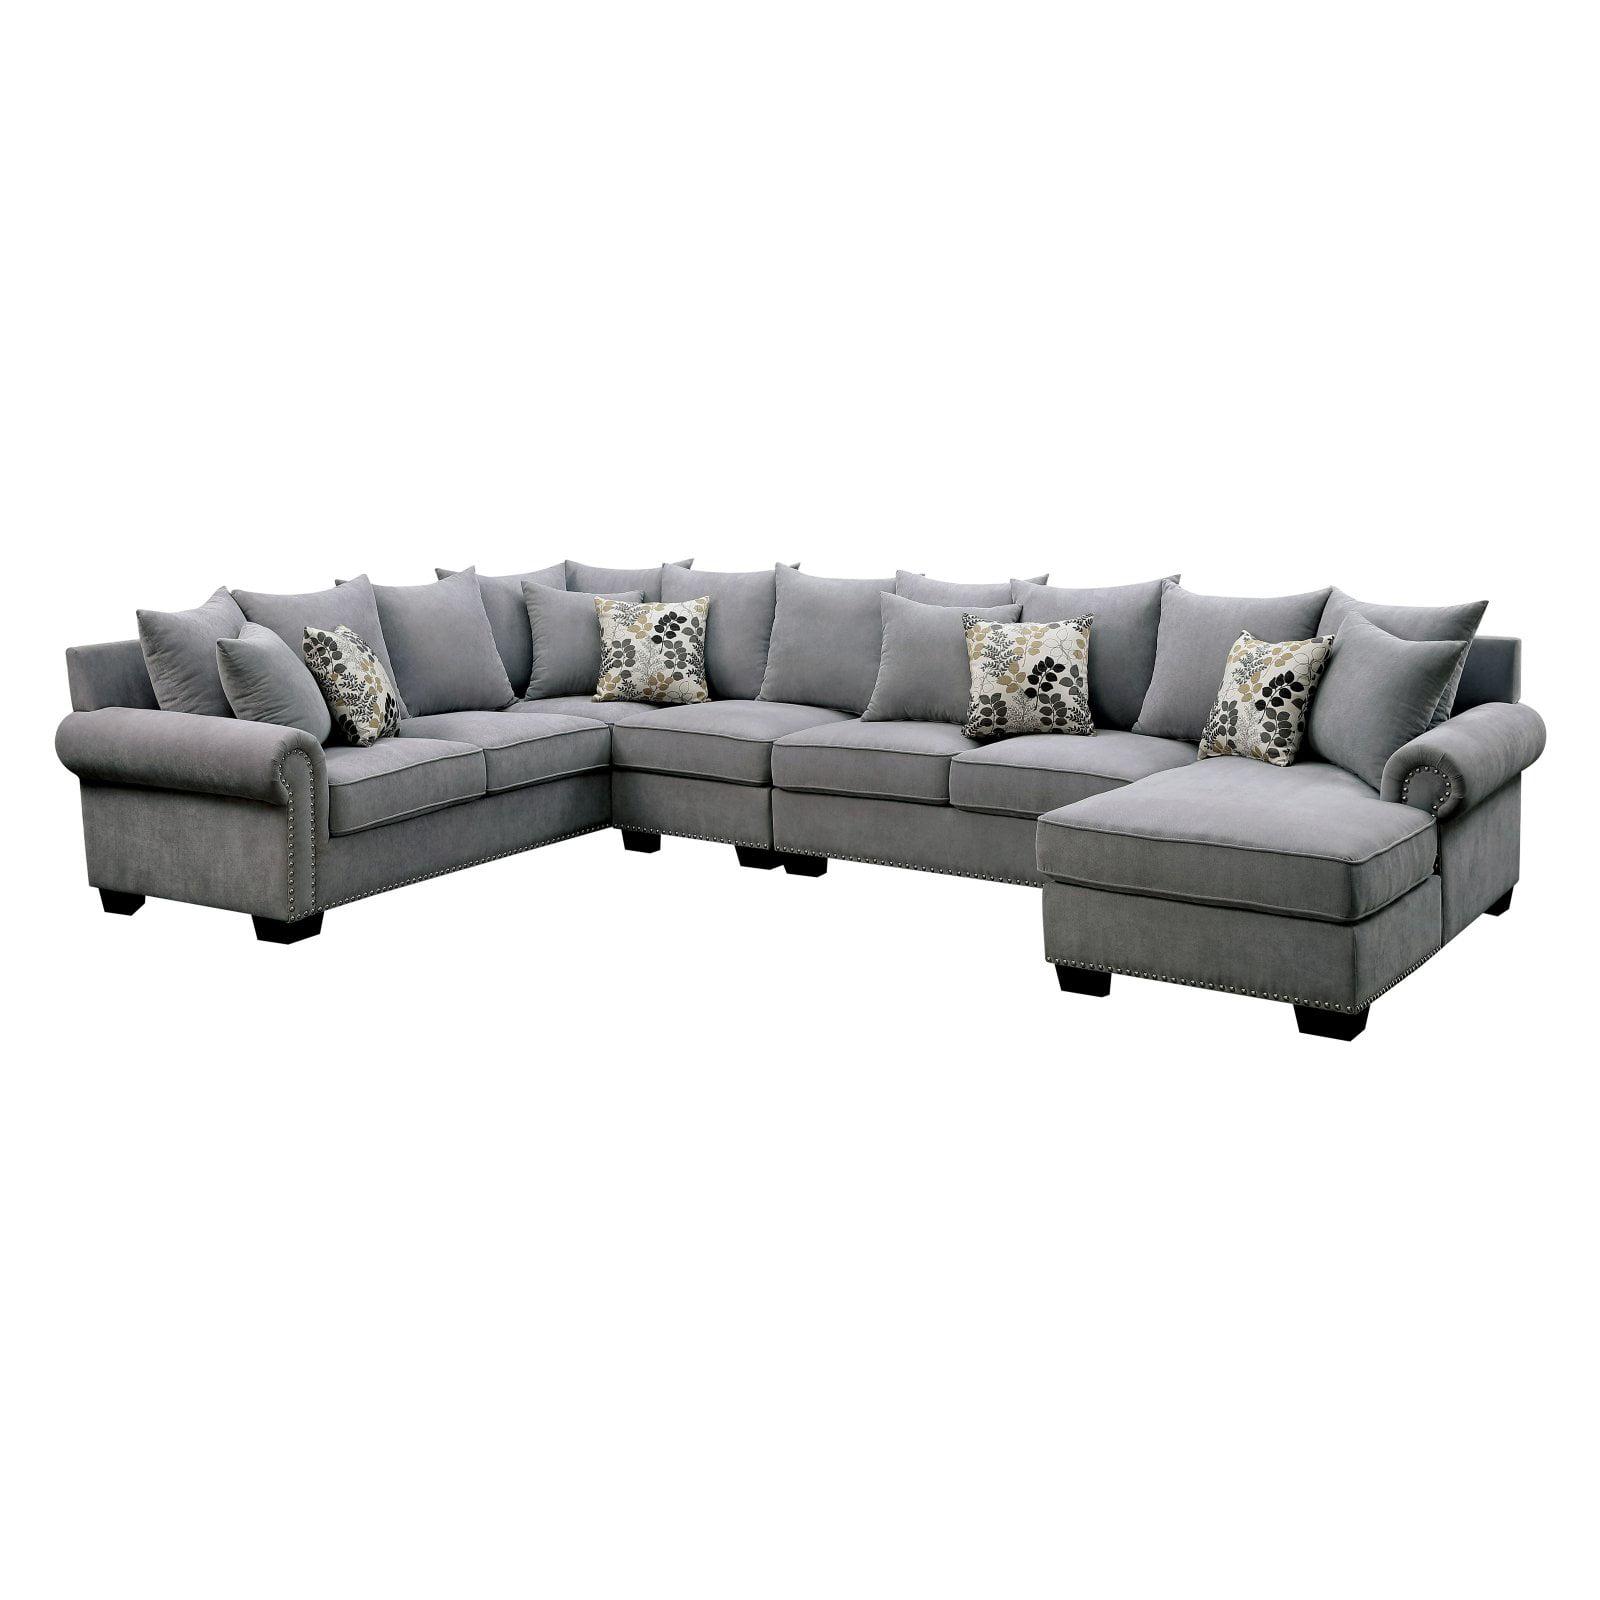 Furniture of america rochelle sectional walmart com